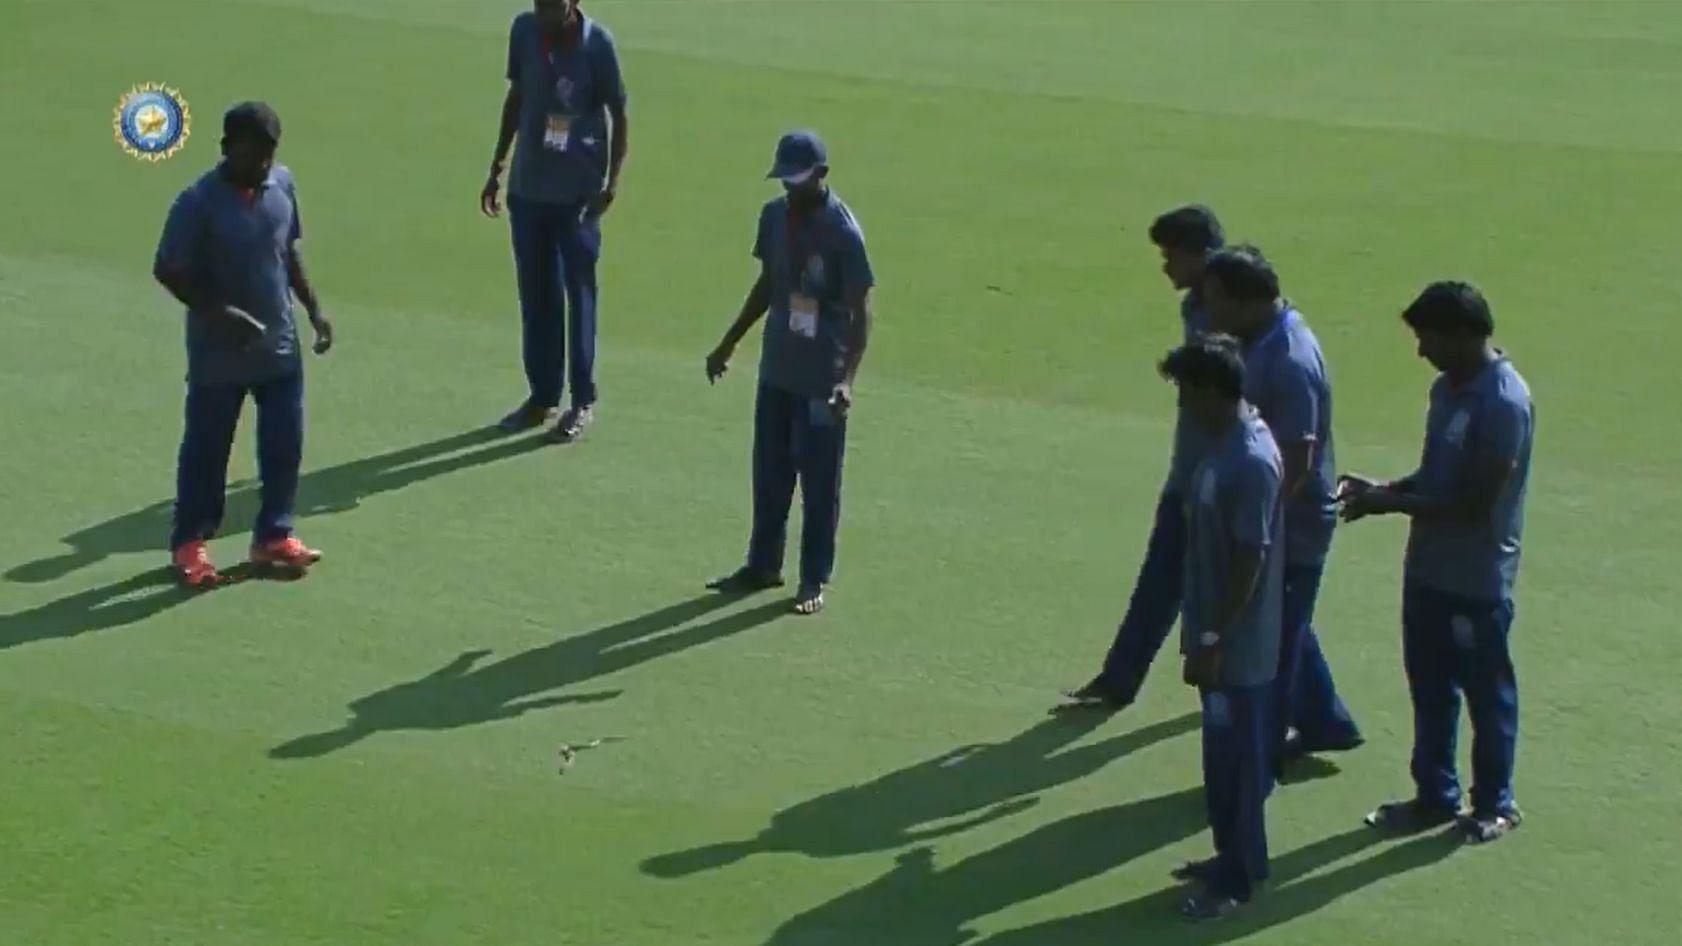 Andhra vs Vidarbha Ranji Game Delayed After Snake Enters Ground